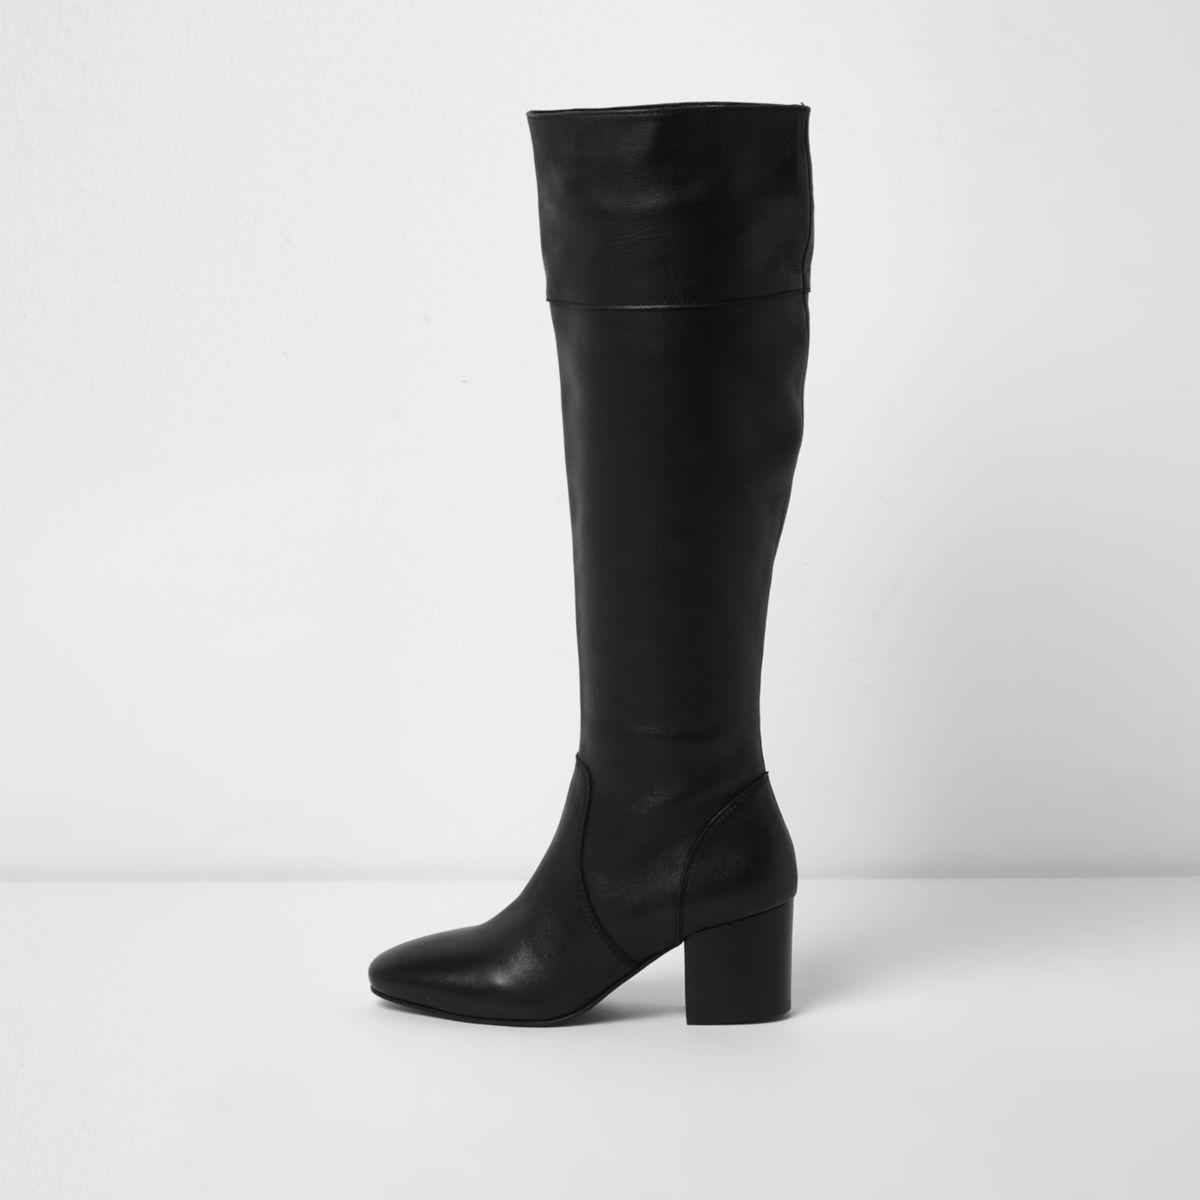 Womens Boots Ladies For Women River Island D Shoes Style Hikers Dm Mens Leather Cokelat Black Knee High Block Heel